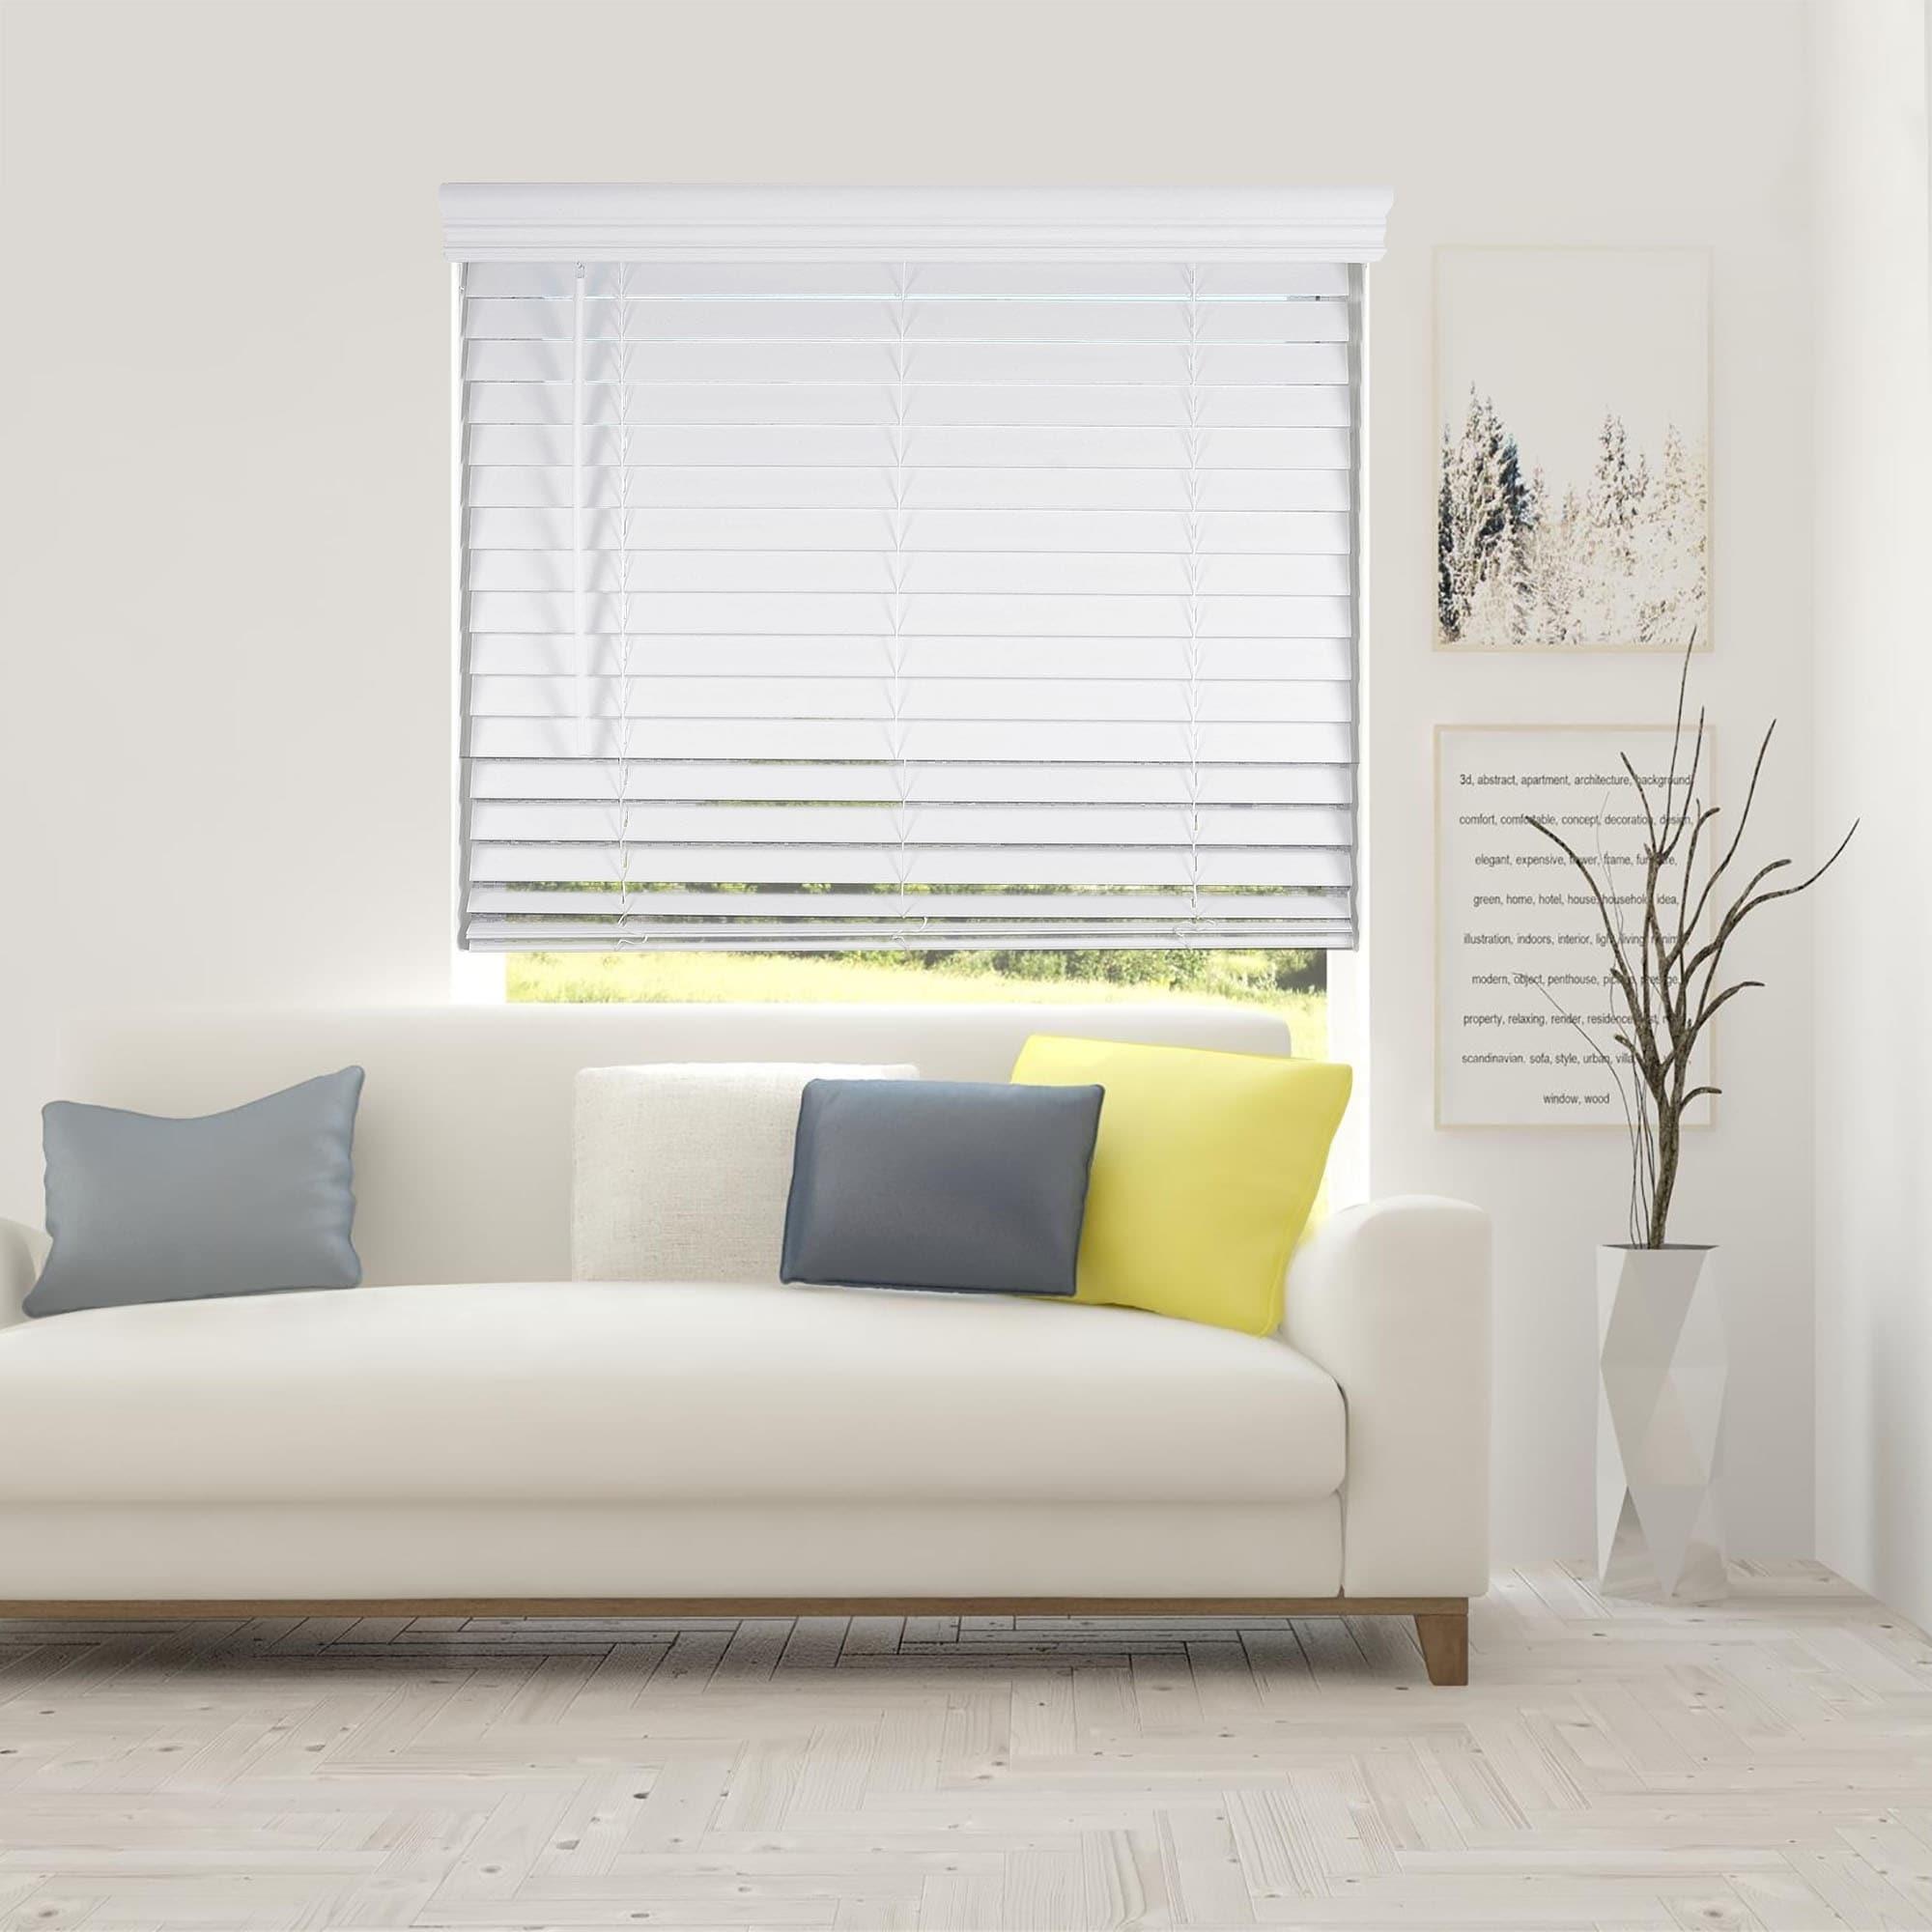 shades window blinds treatments bamboo rhholodukecom cordless room public faux wood attachment blackout roman for valances